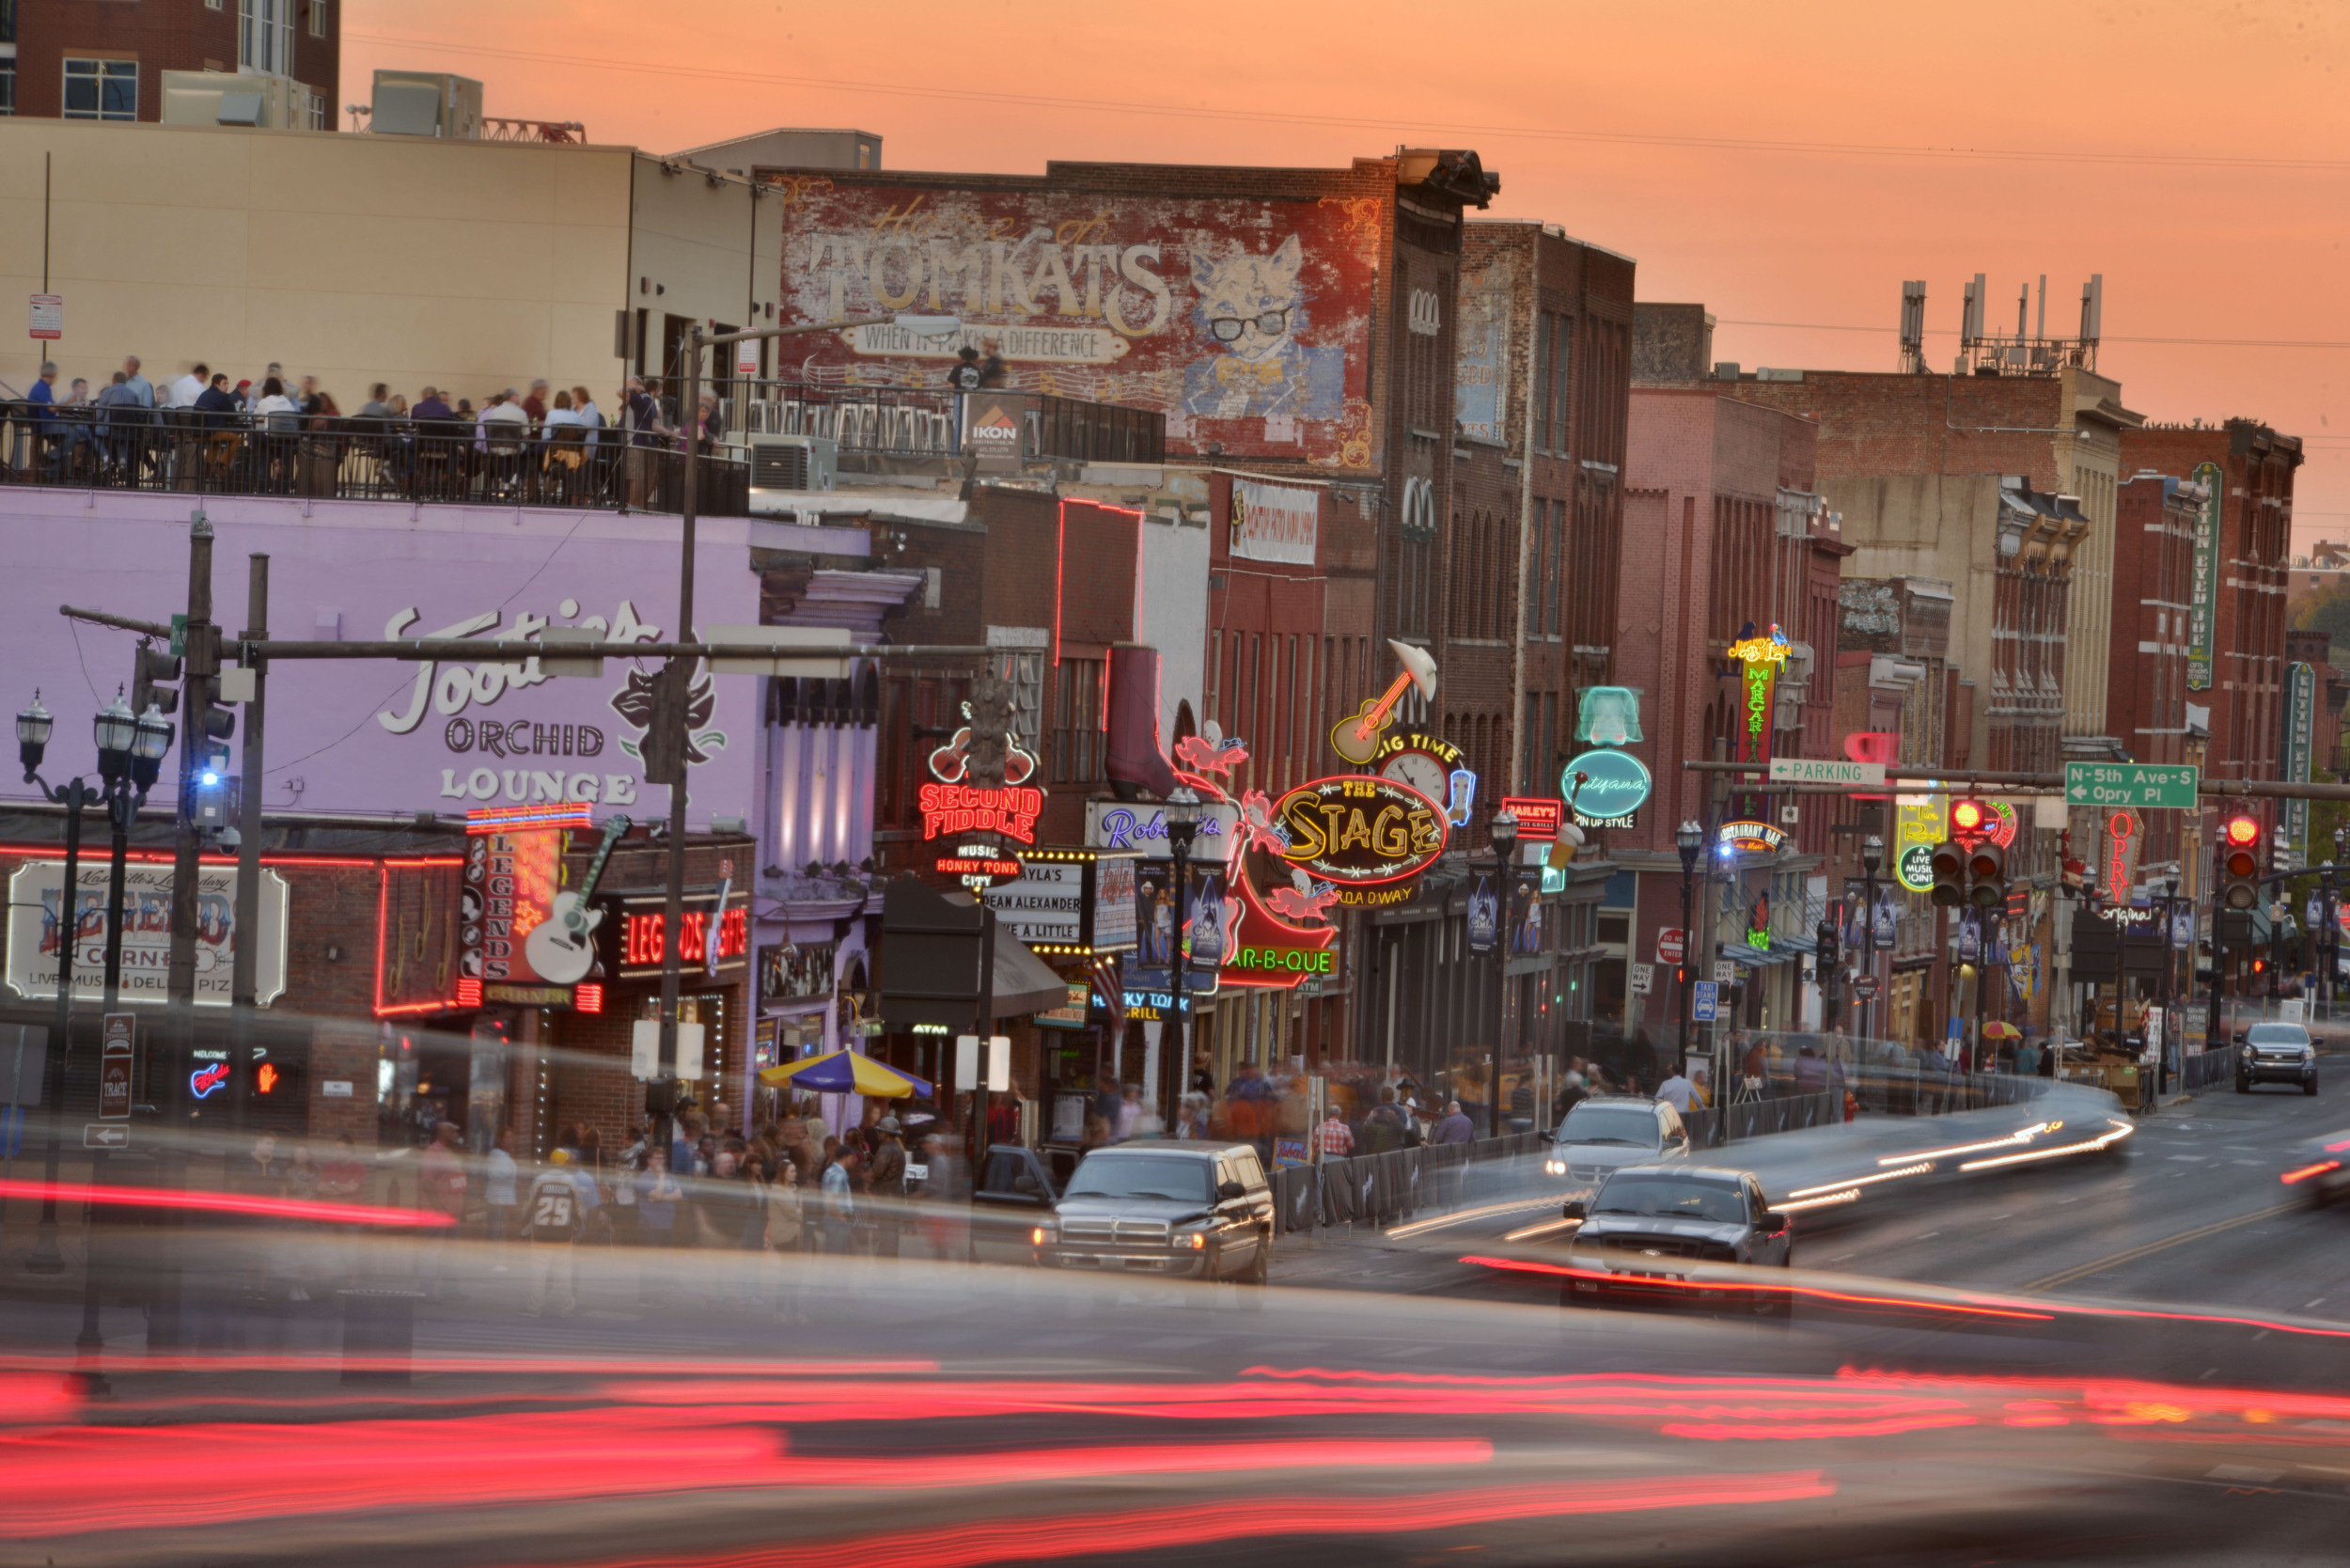 Broadway Avenue along honky tonk row in downtown Nashville, Tenn.